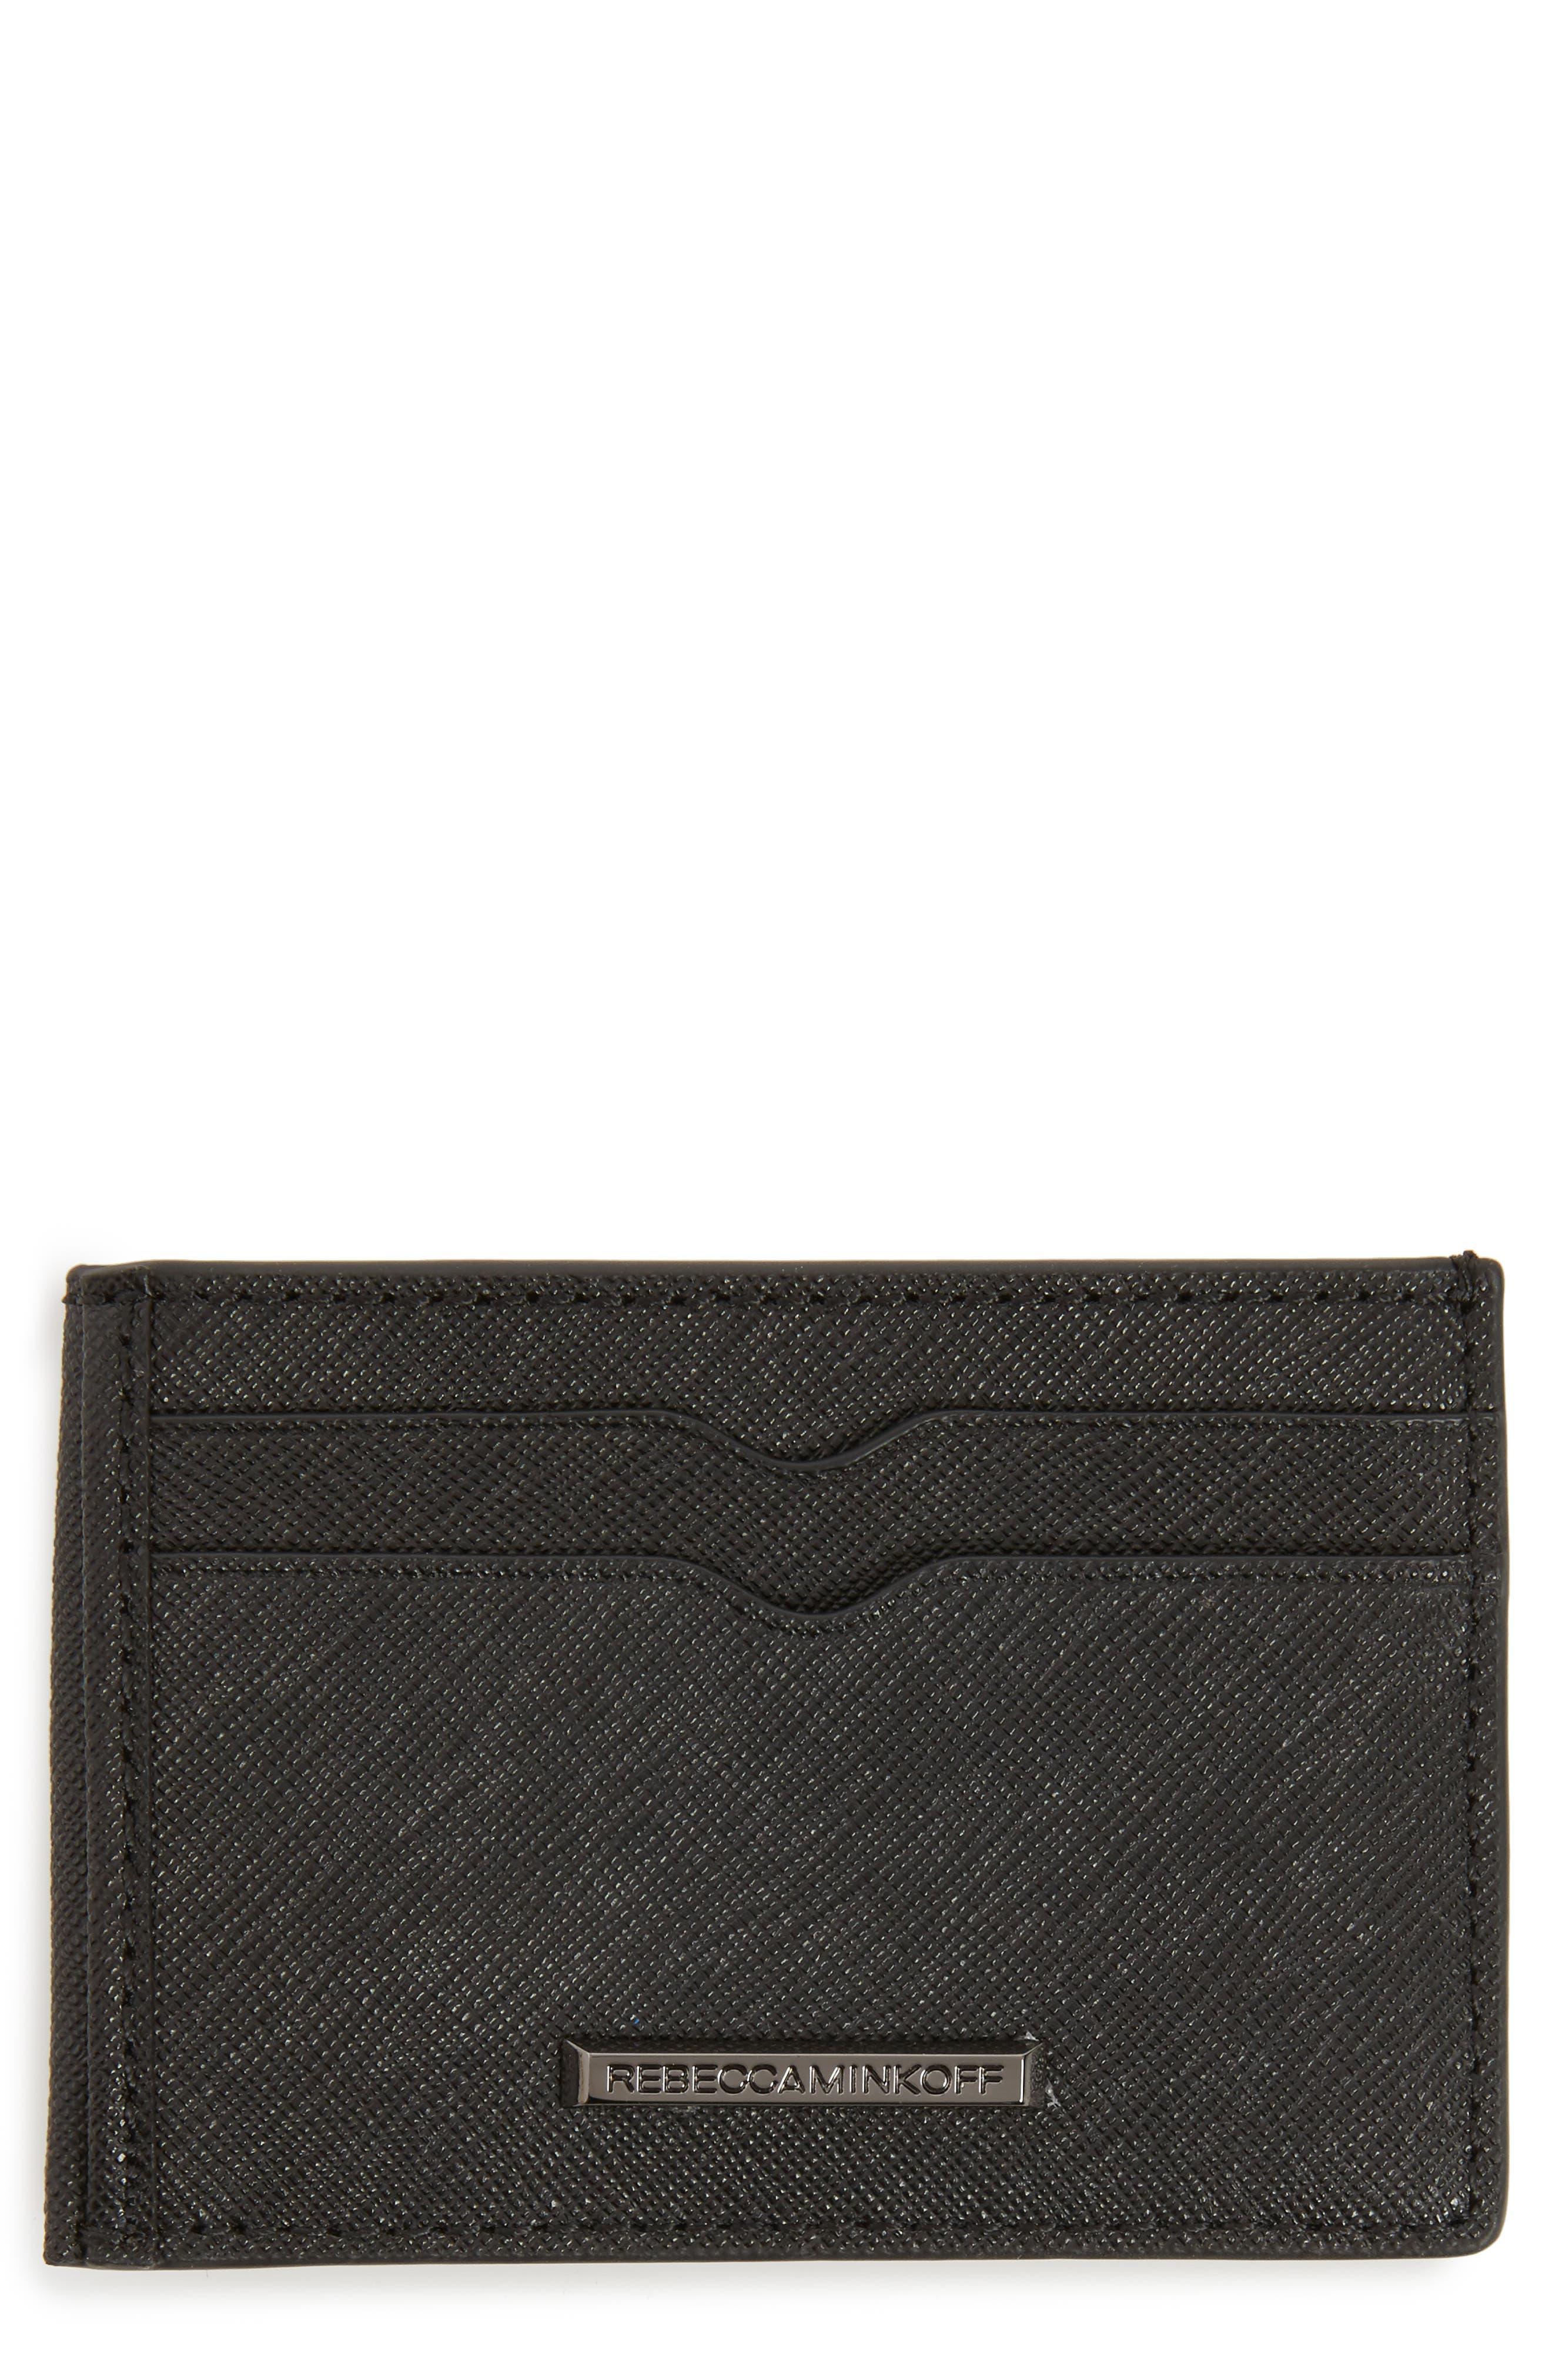 Metro Leather Card Case,                             Main thumbnail 1, color,                             Black